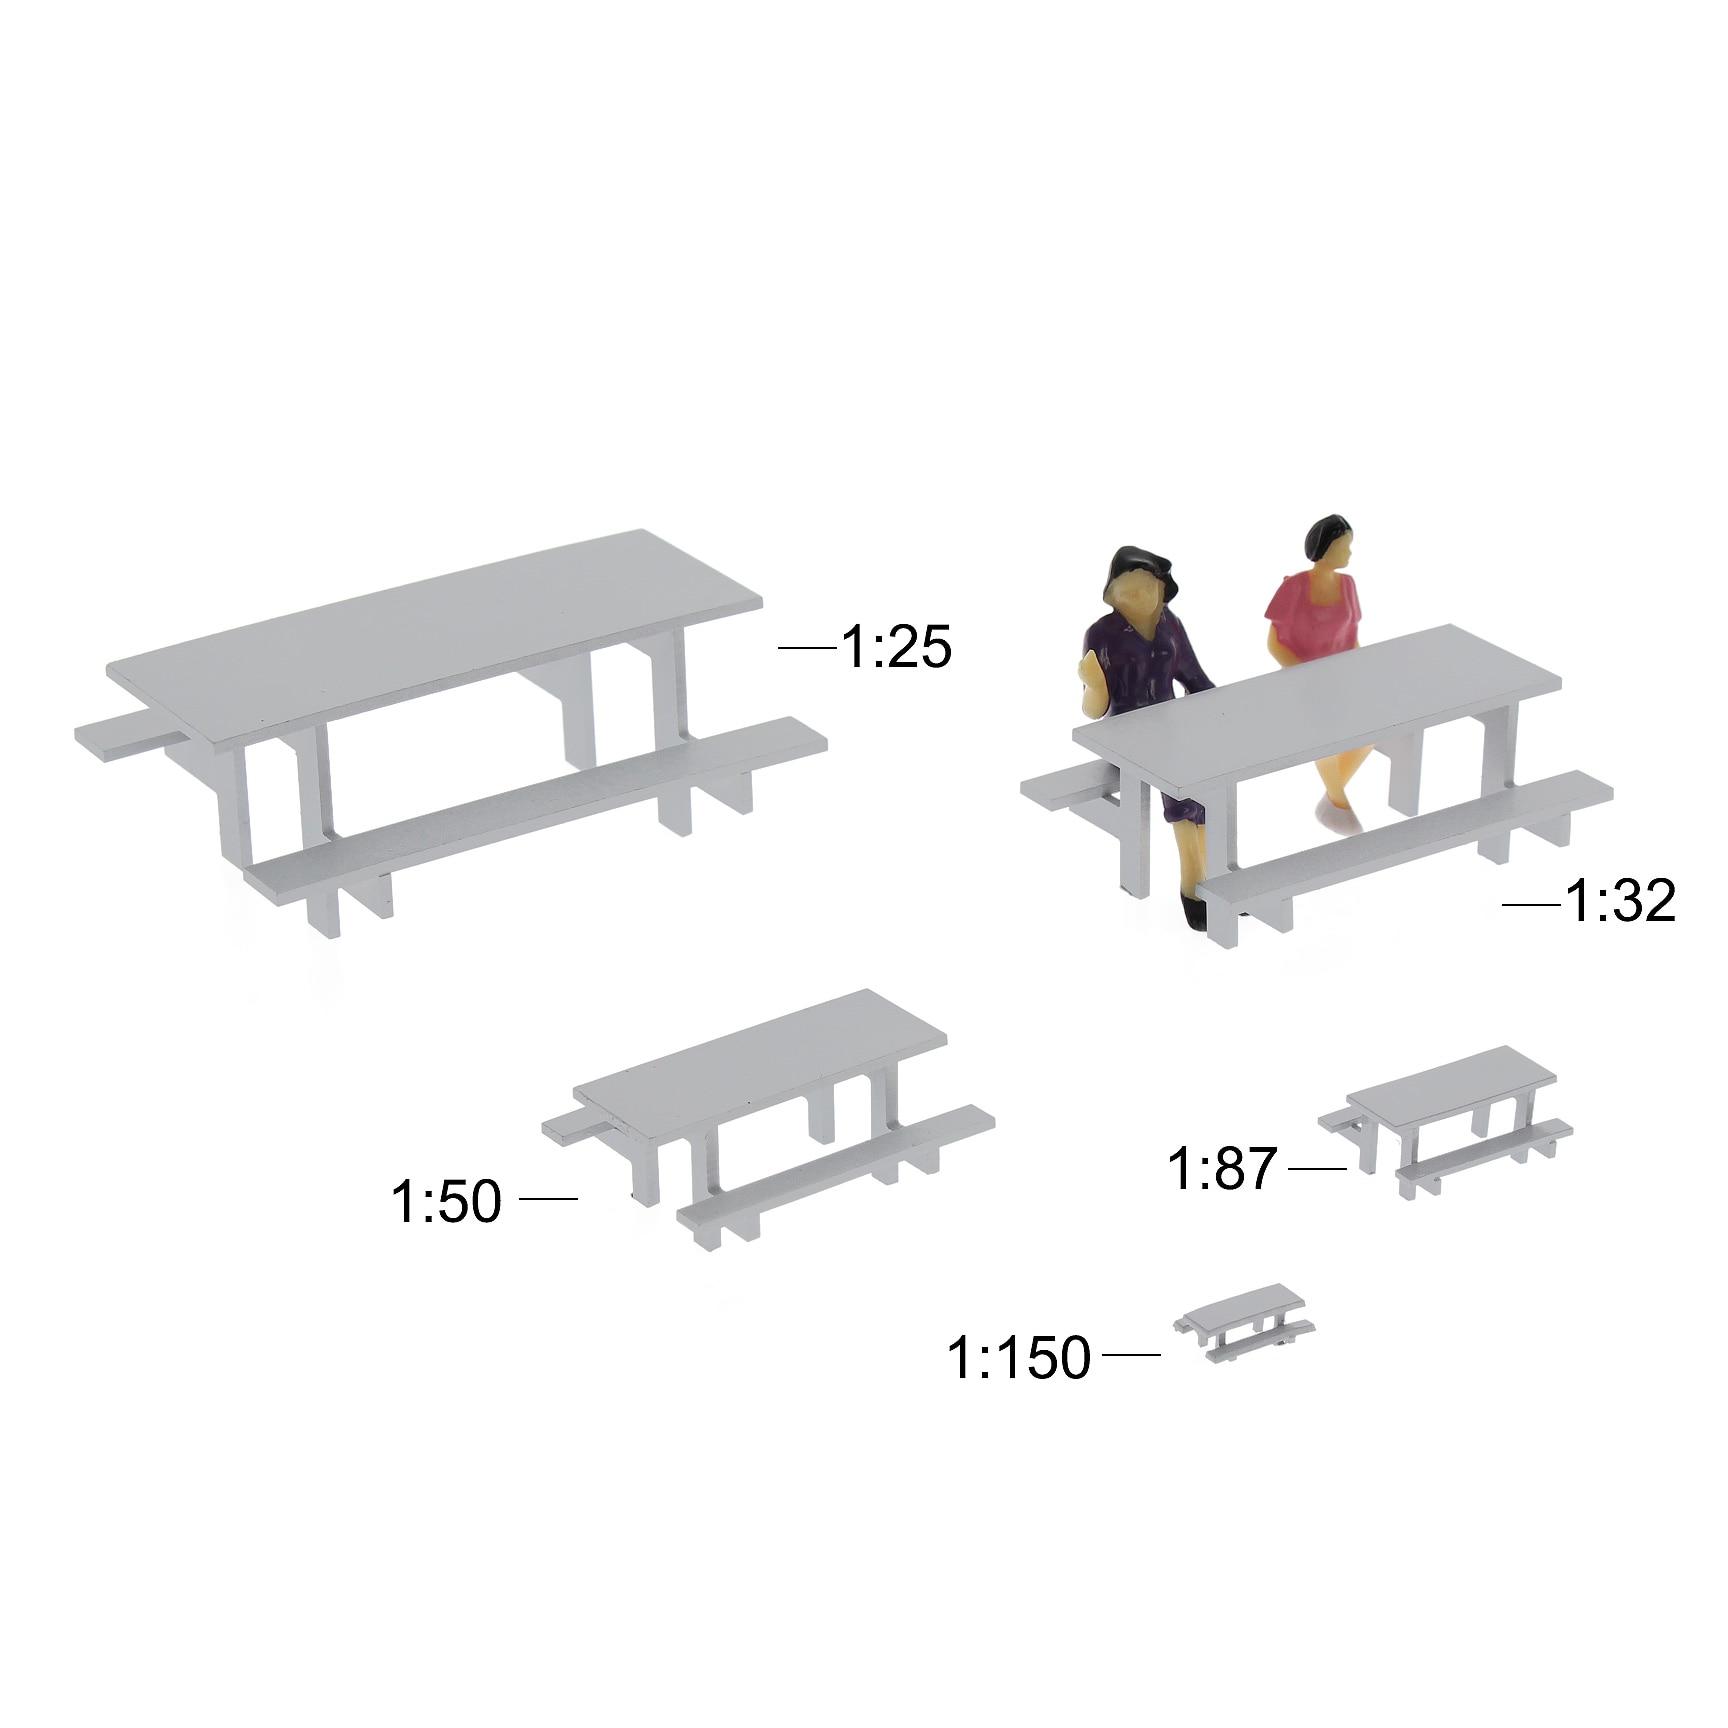 5 шт./10 шт. модель поезд G O HO N масштаб серый Модель стол стул кемпинг открытый стол скамейка набор Модель Пейзаж